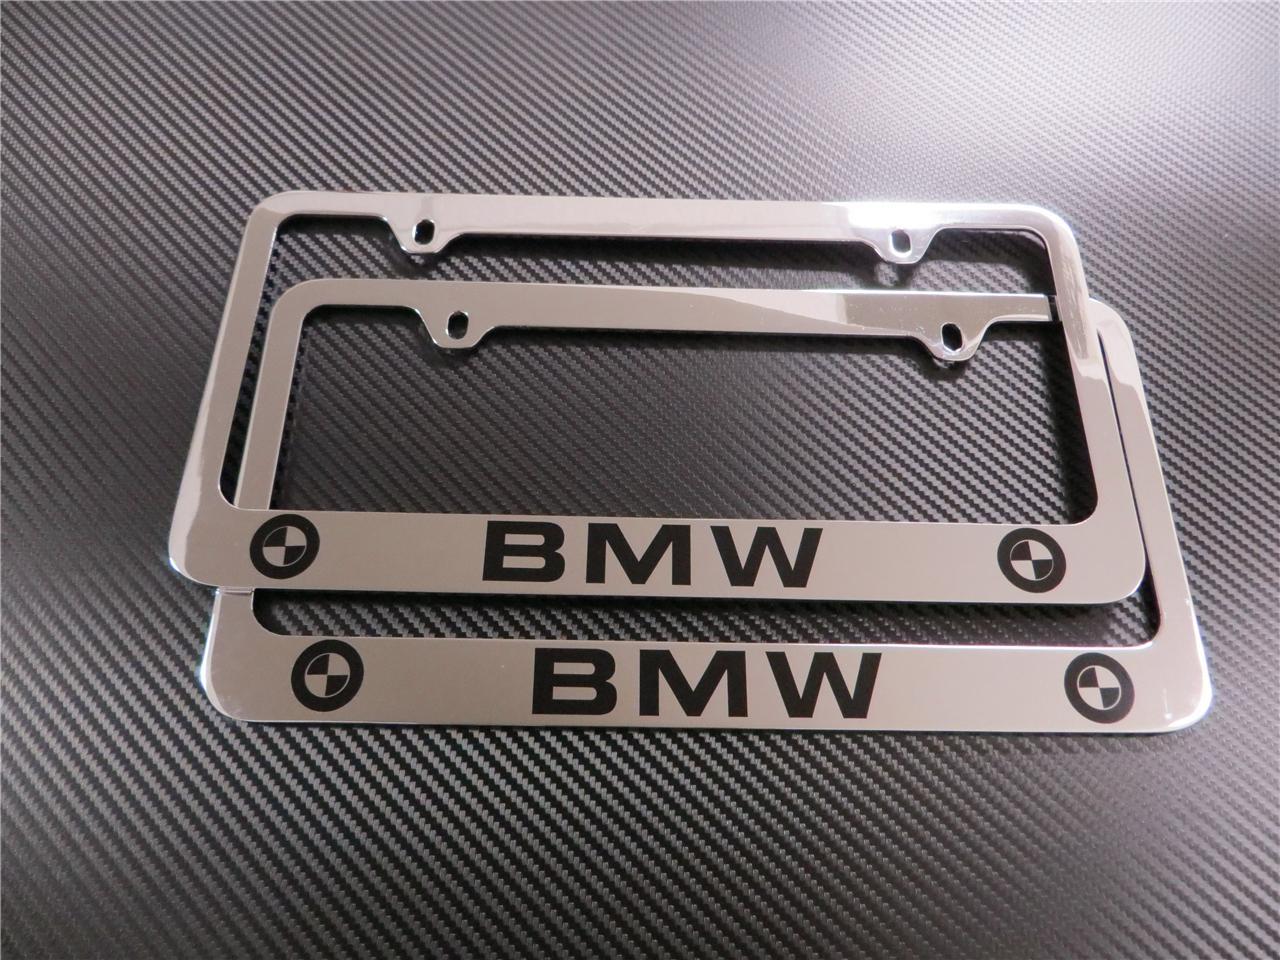 ShopBMWUSAcom BMW M LOGO LICENSE PLATE FRAMES